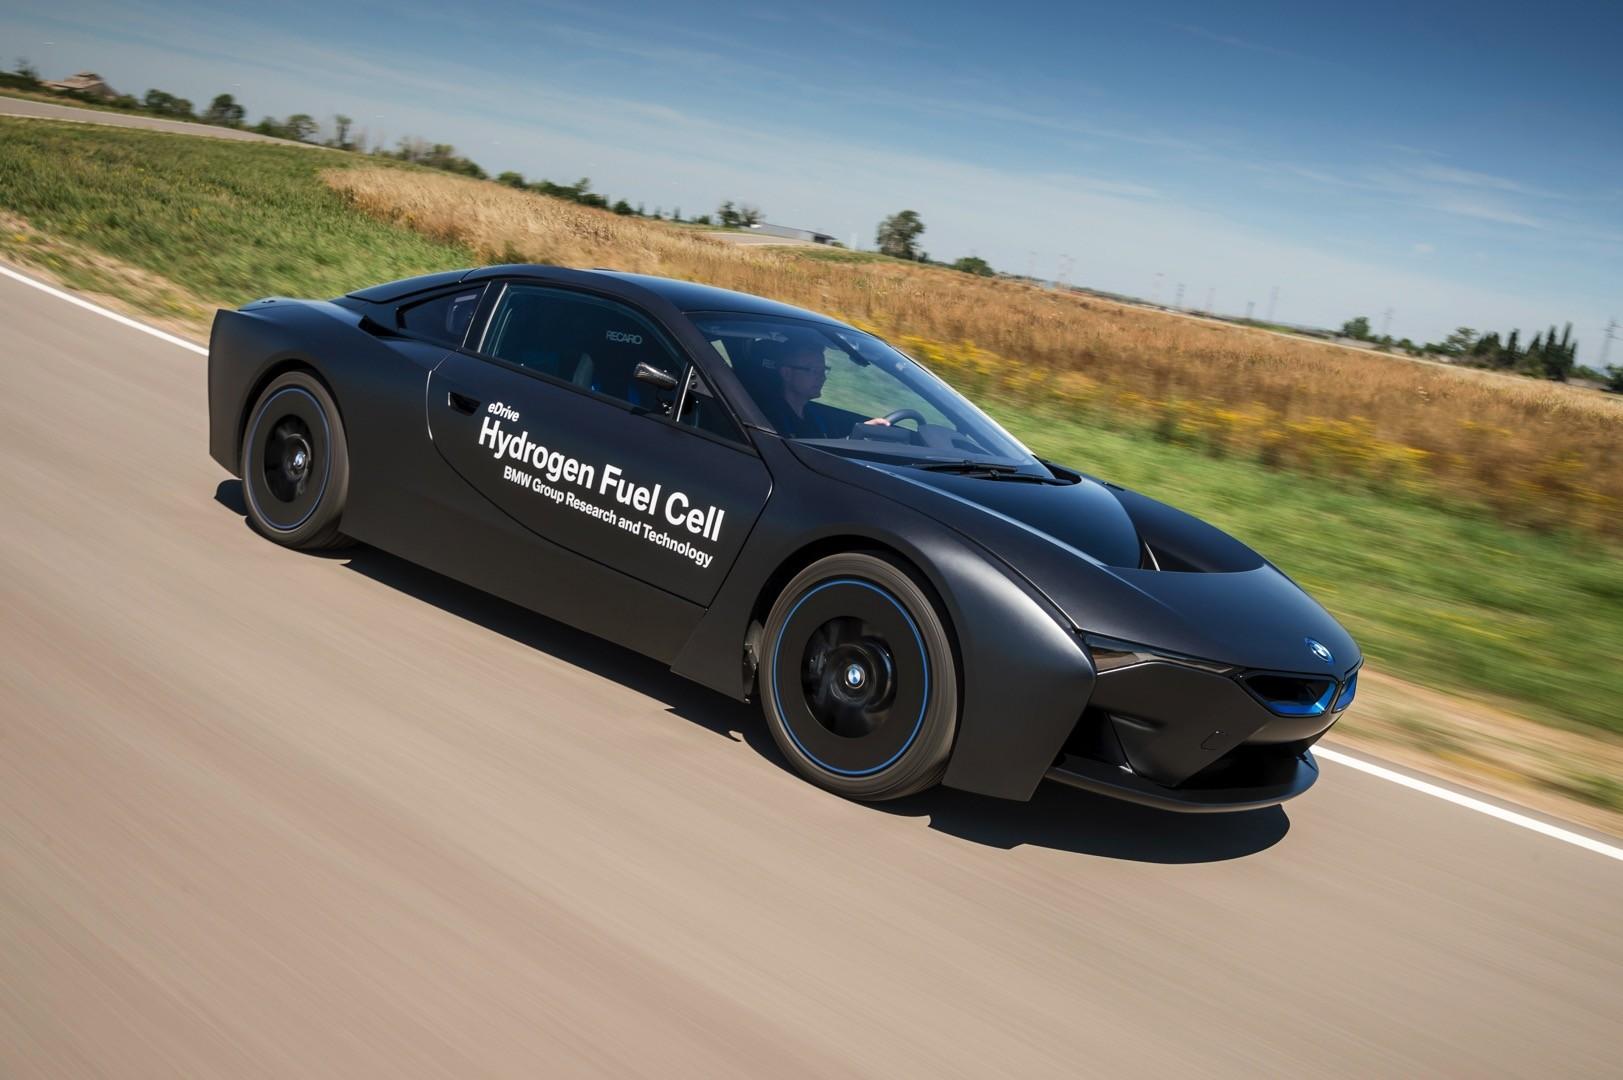 BMW Z4 Successor Will Have Inline 6-cylinder engine - Report